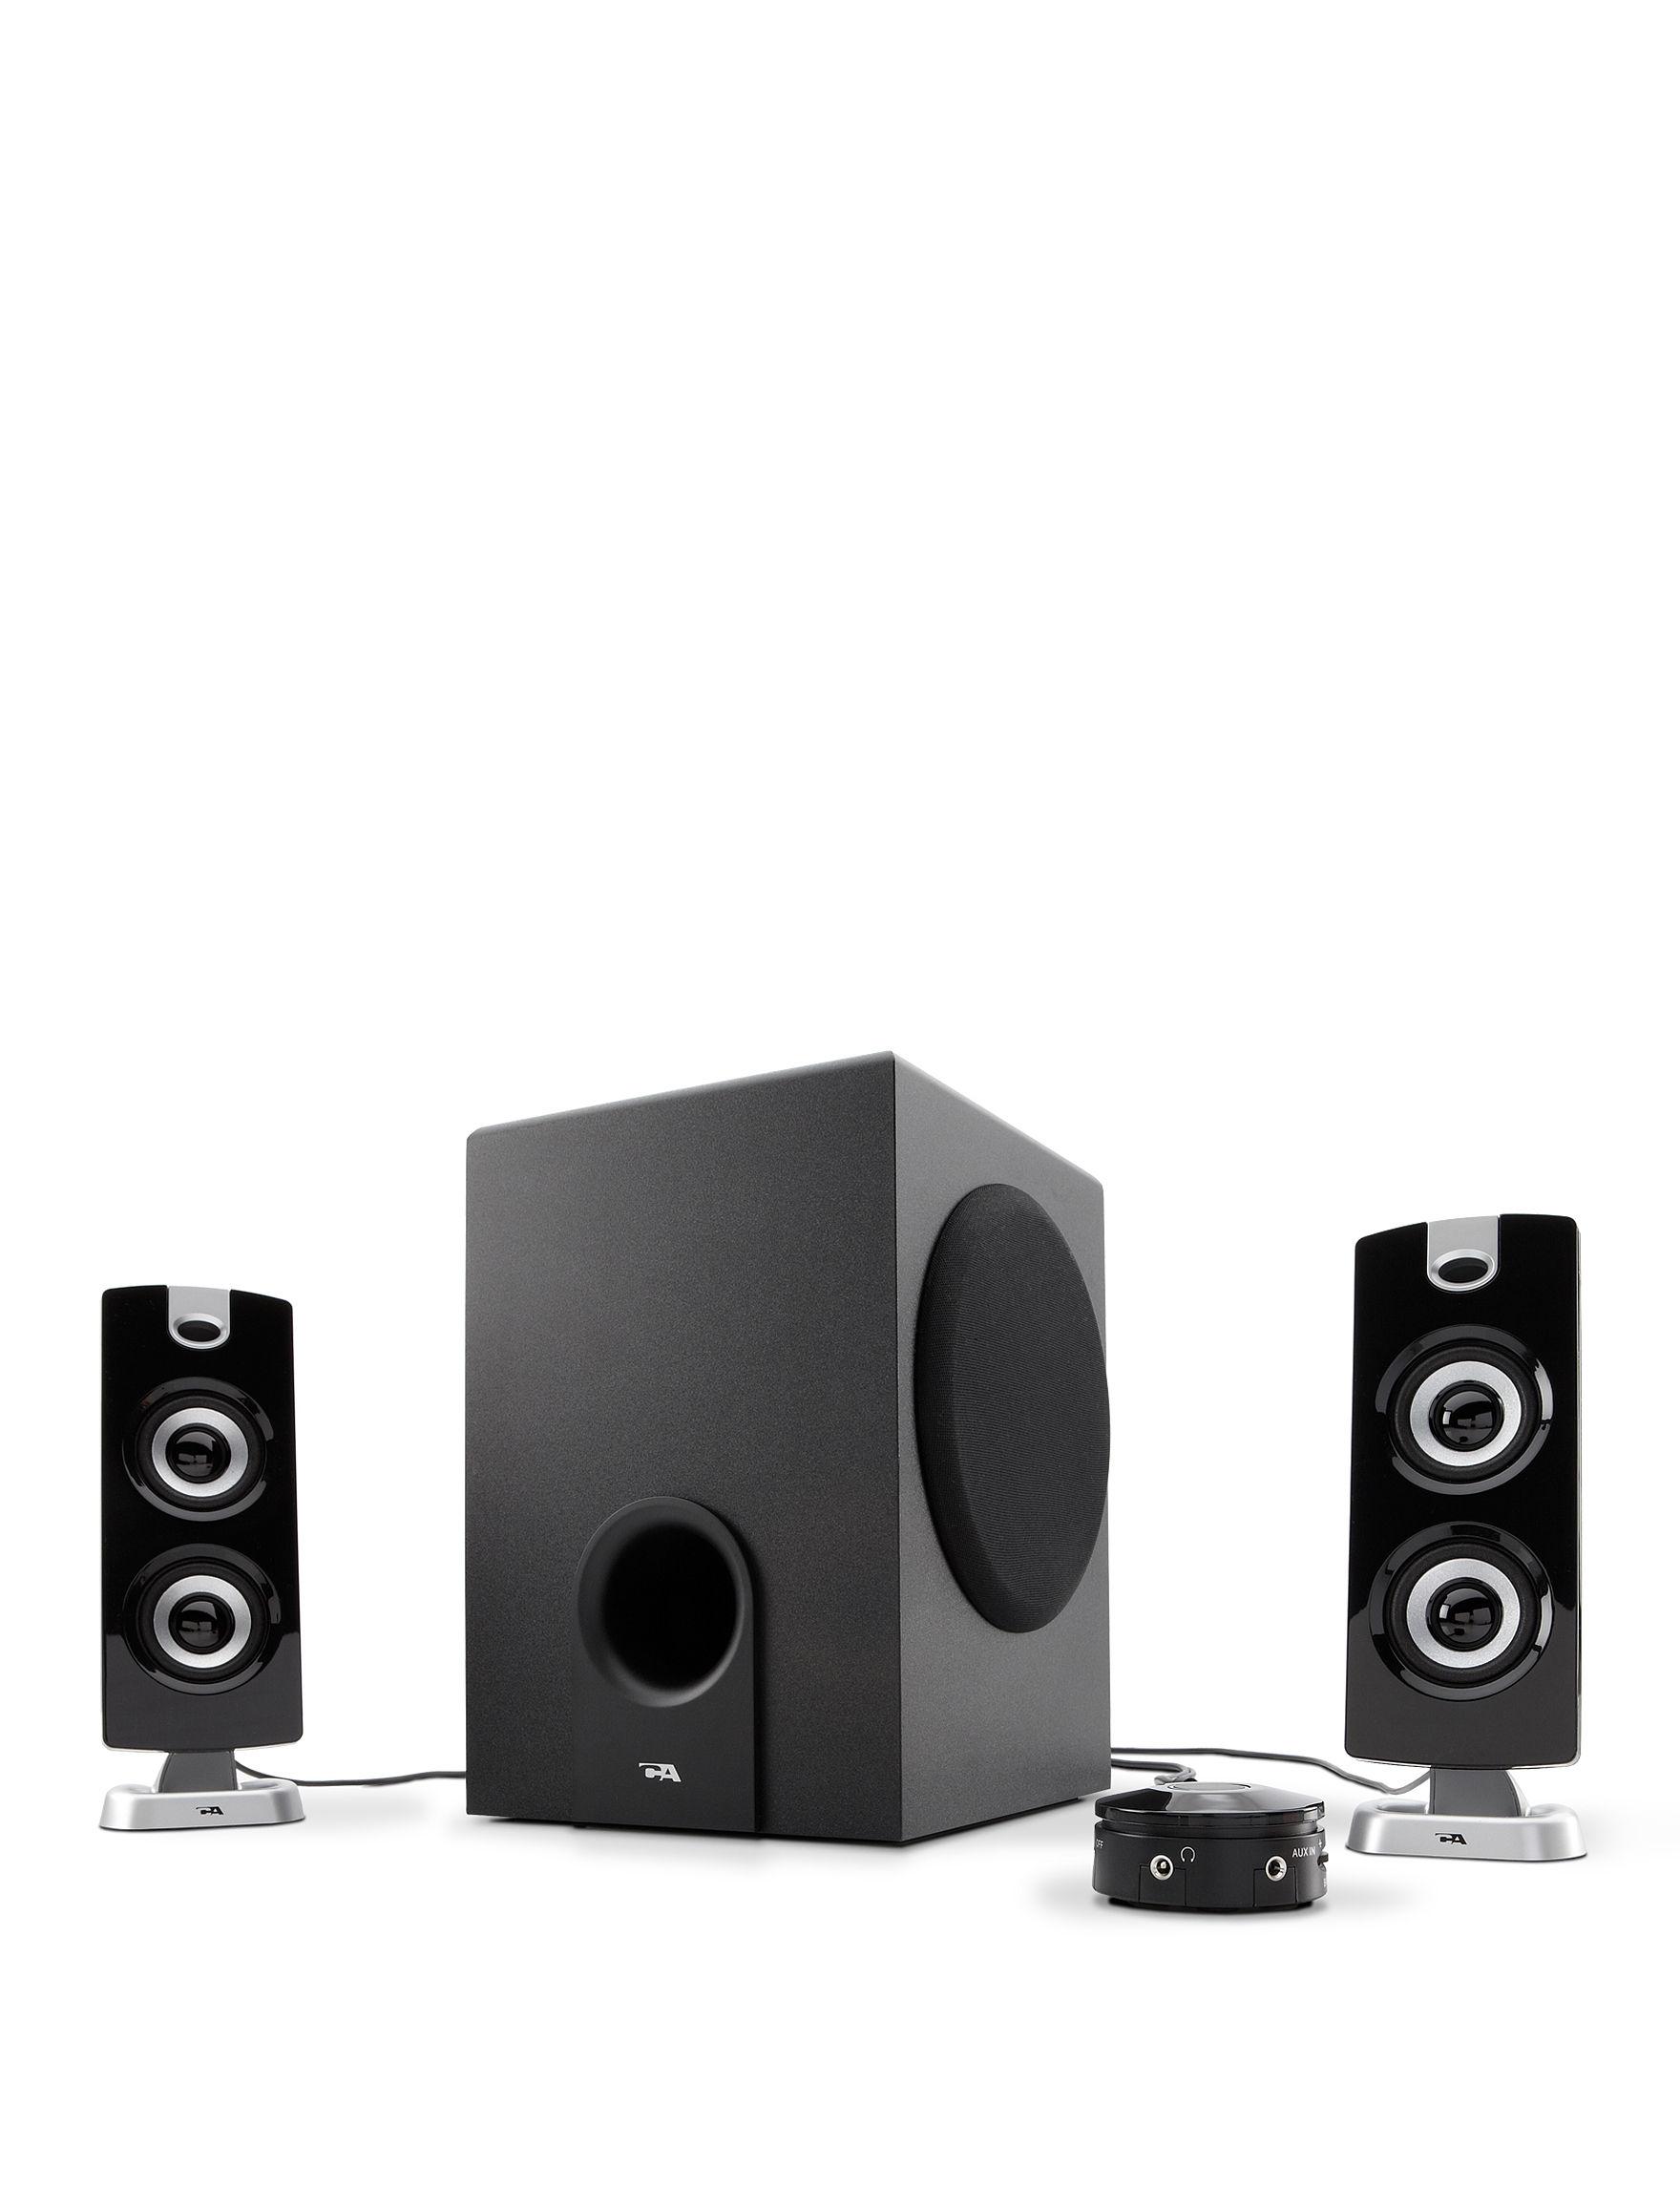 Cyber Acoustics Black Speakers & Docks Home & Portable Audio